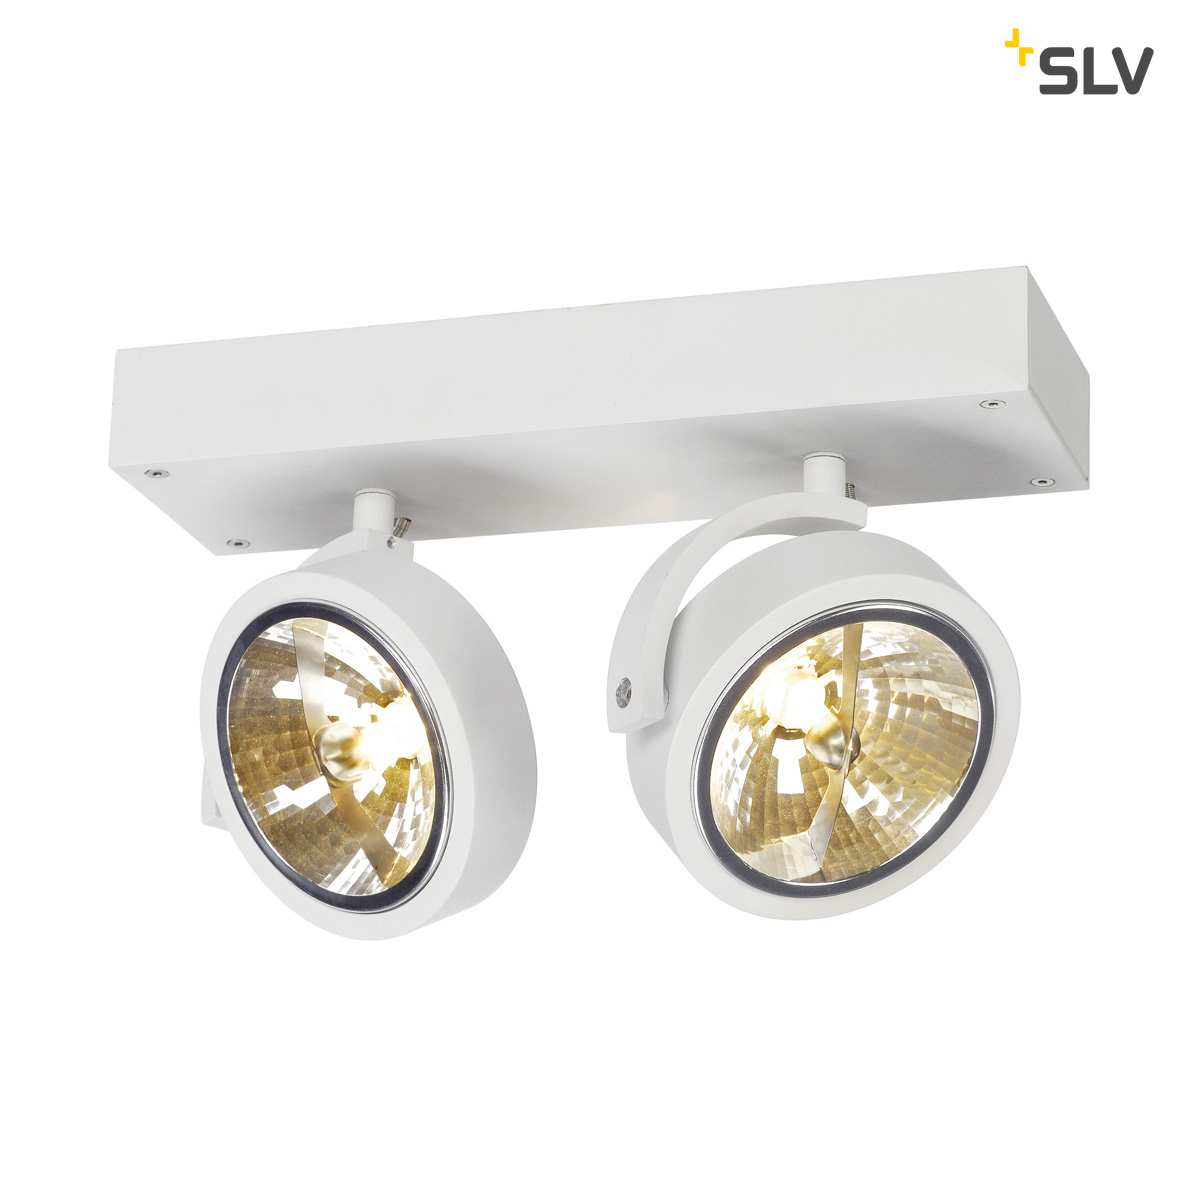 SLV - Kalu 2